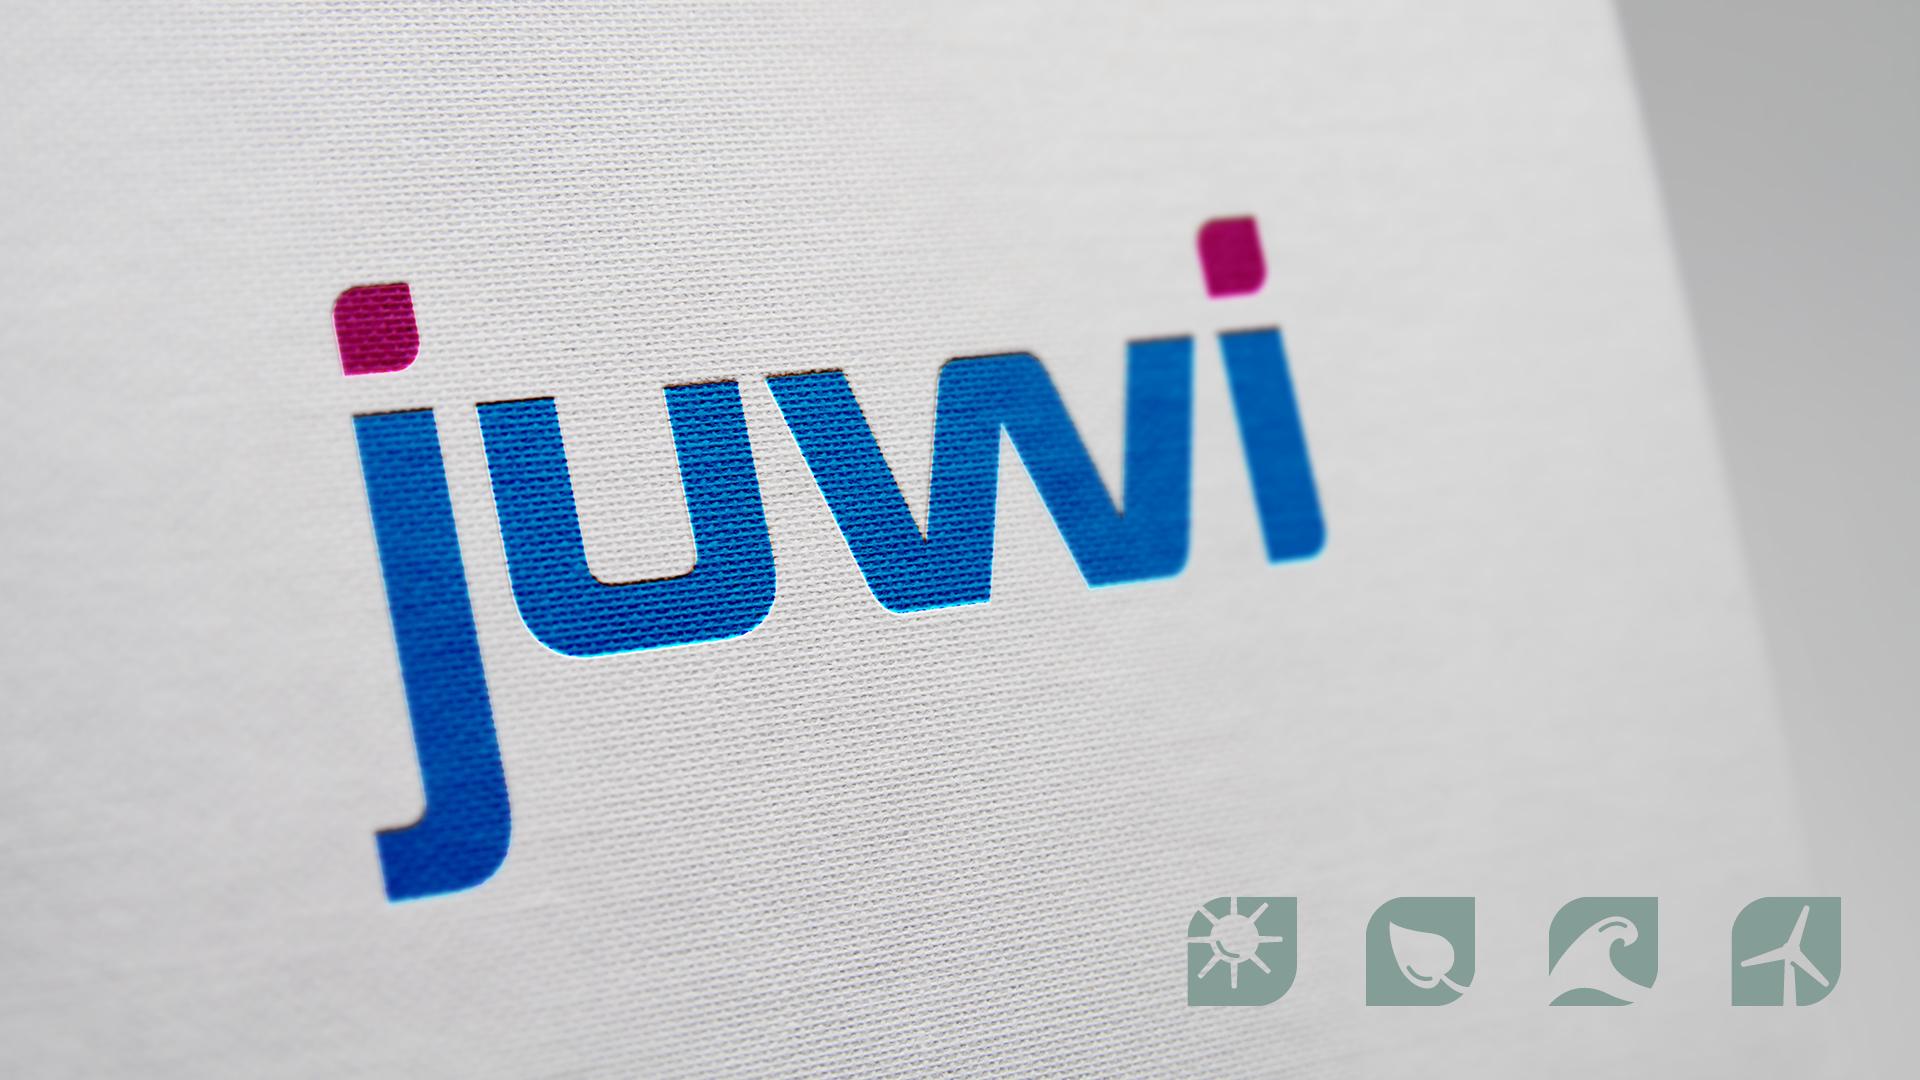 Juwi Wortmarke